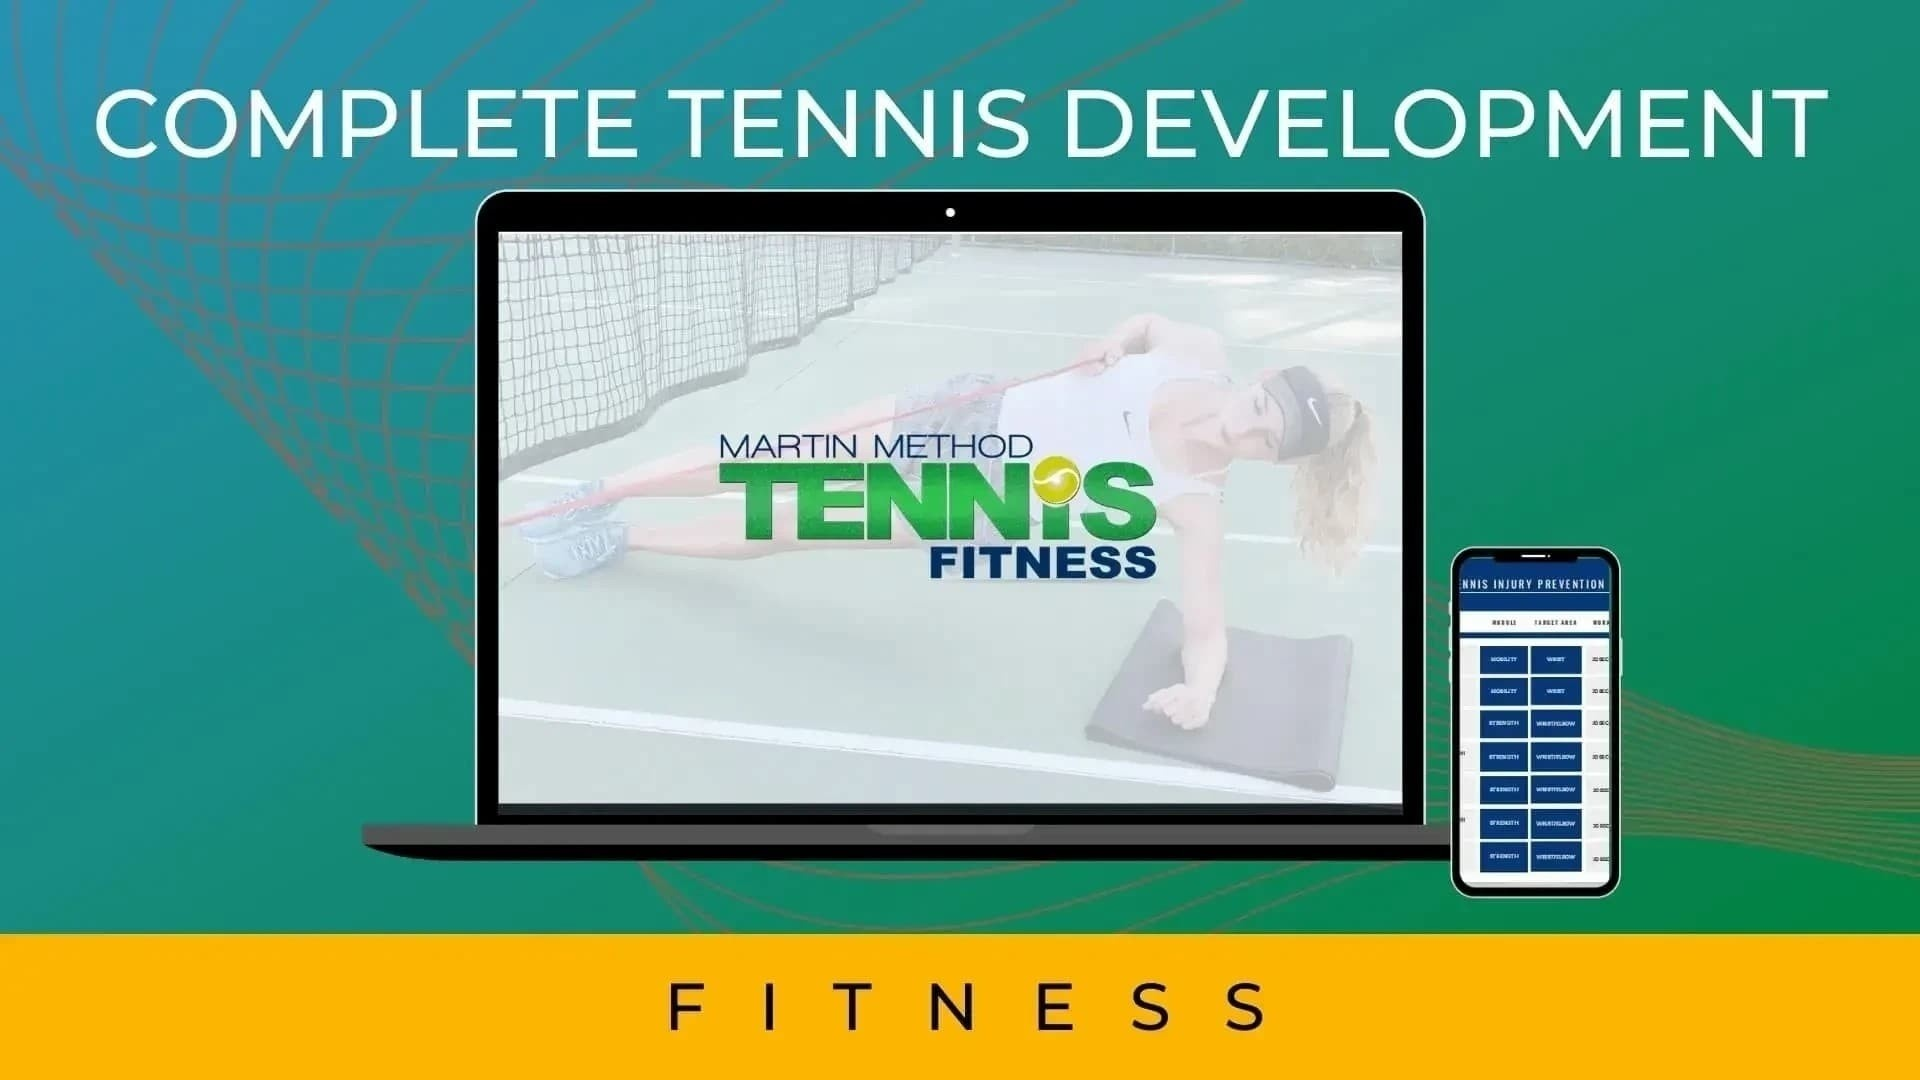 fitness-injury-prevention-1